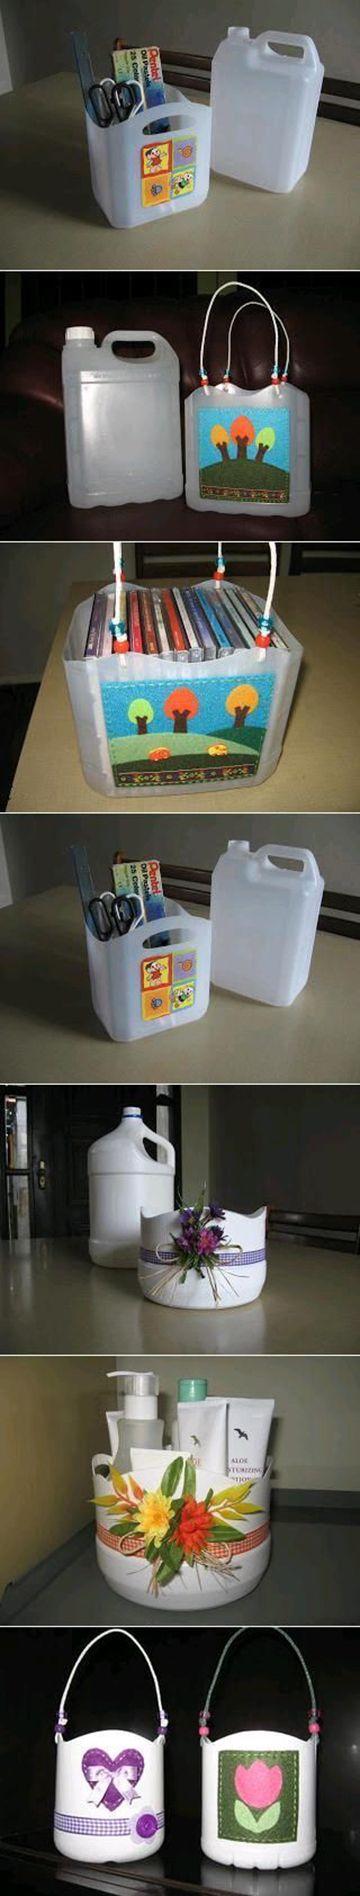 Recycling plastic bottle baskets diy diy ideas diy crafts do it recycling plastic bottle baskets diy diy ideas diy crafts do it yourself crafty diy pictures plastic solutioingenieria Images